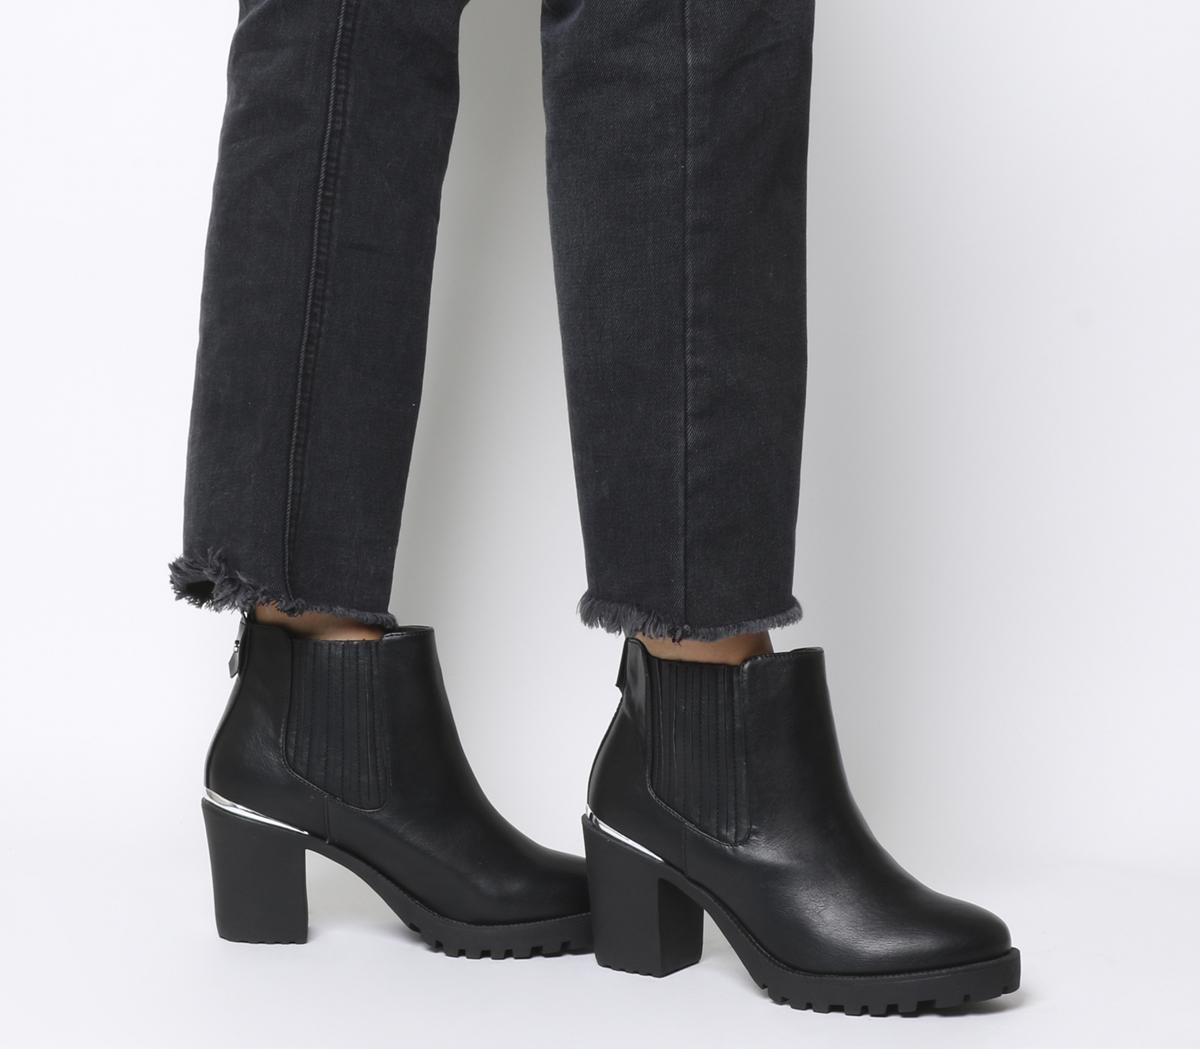 Agile Chunky Chelsea Boots